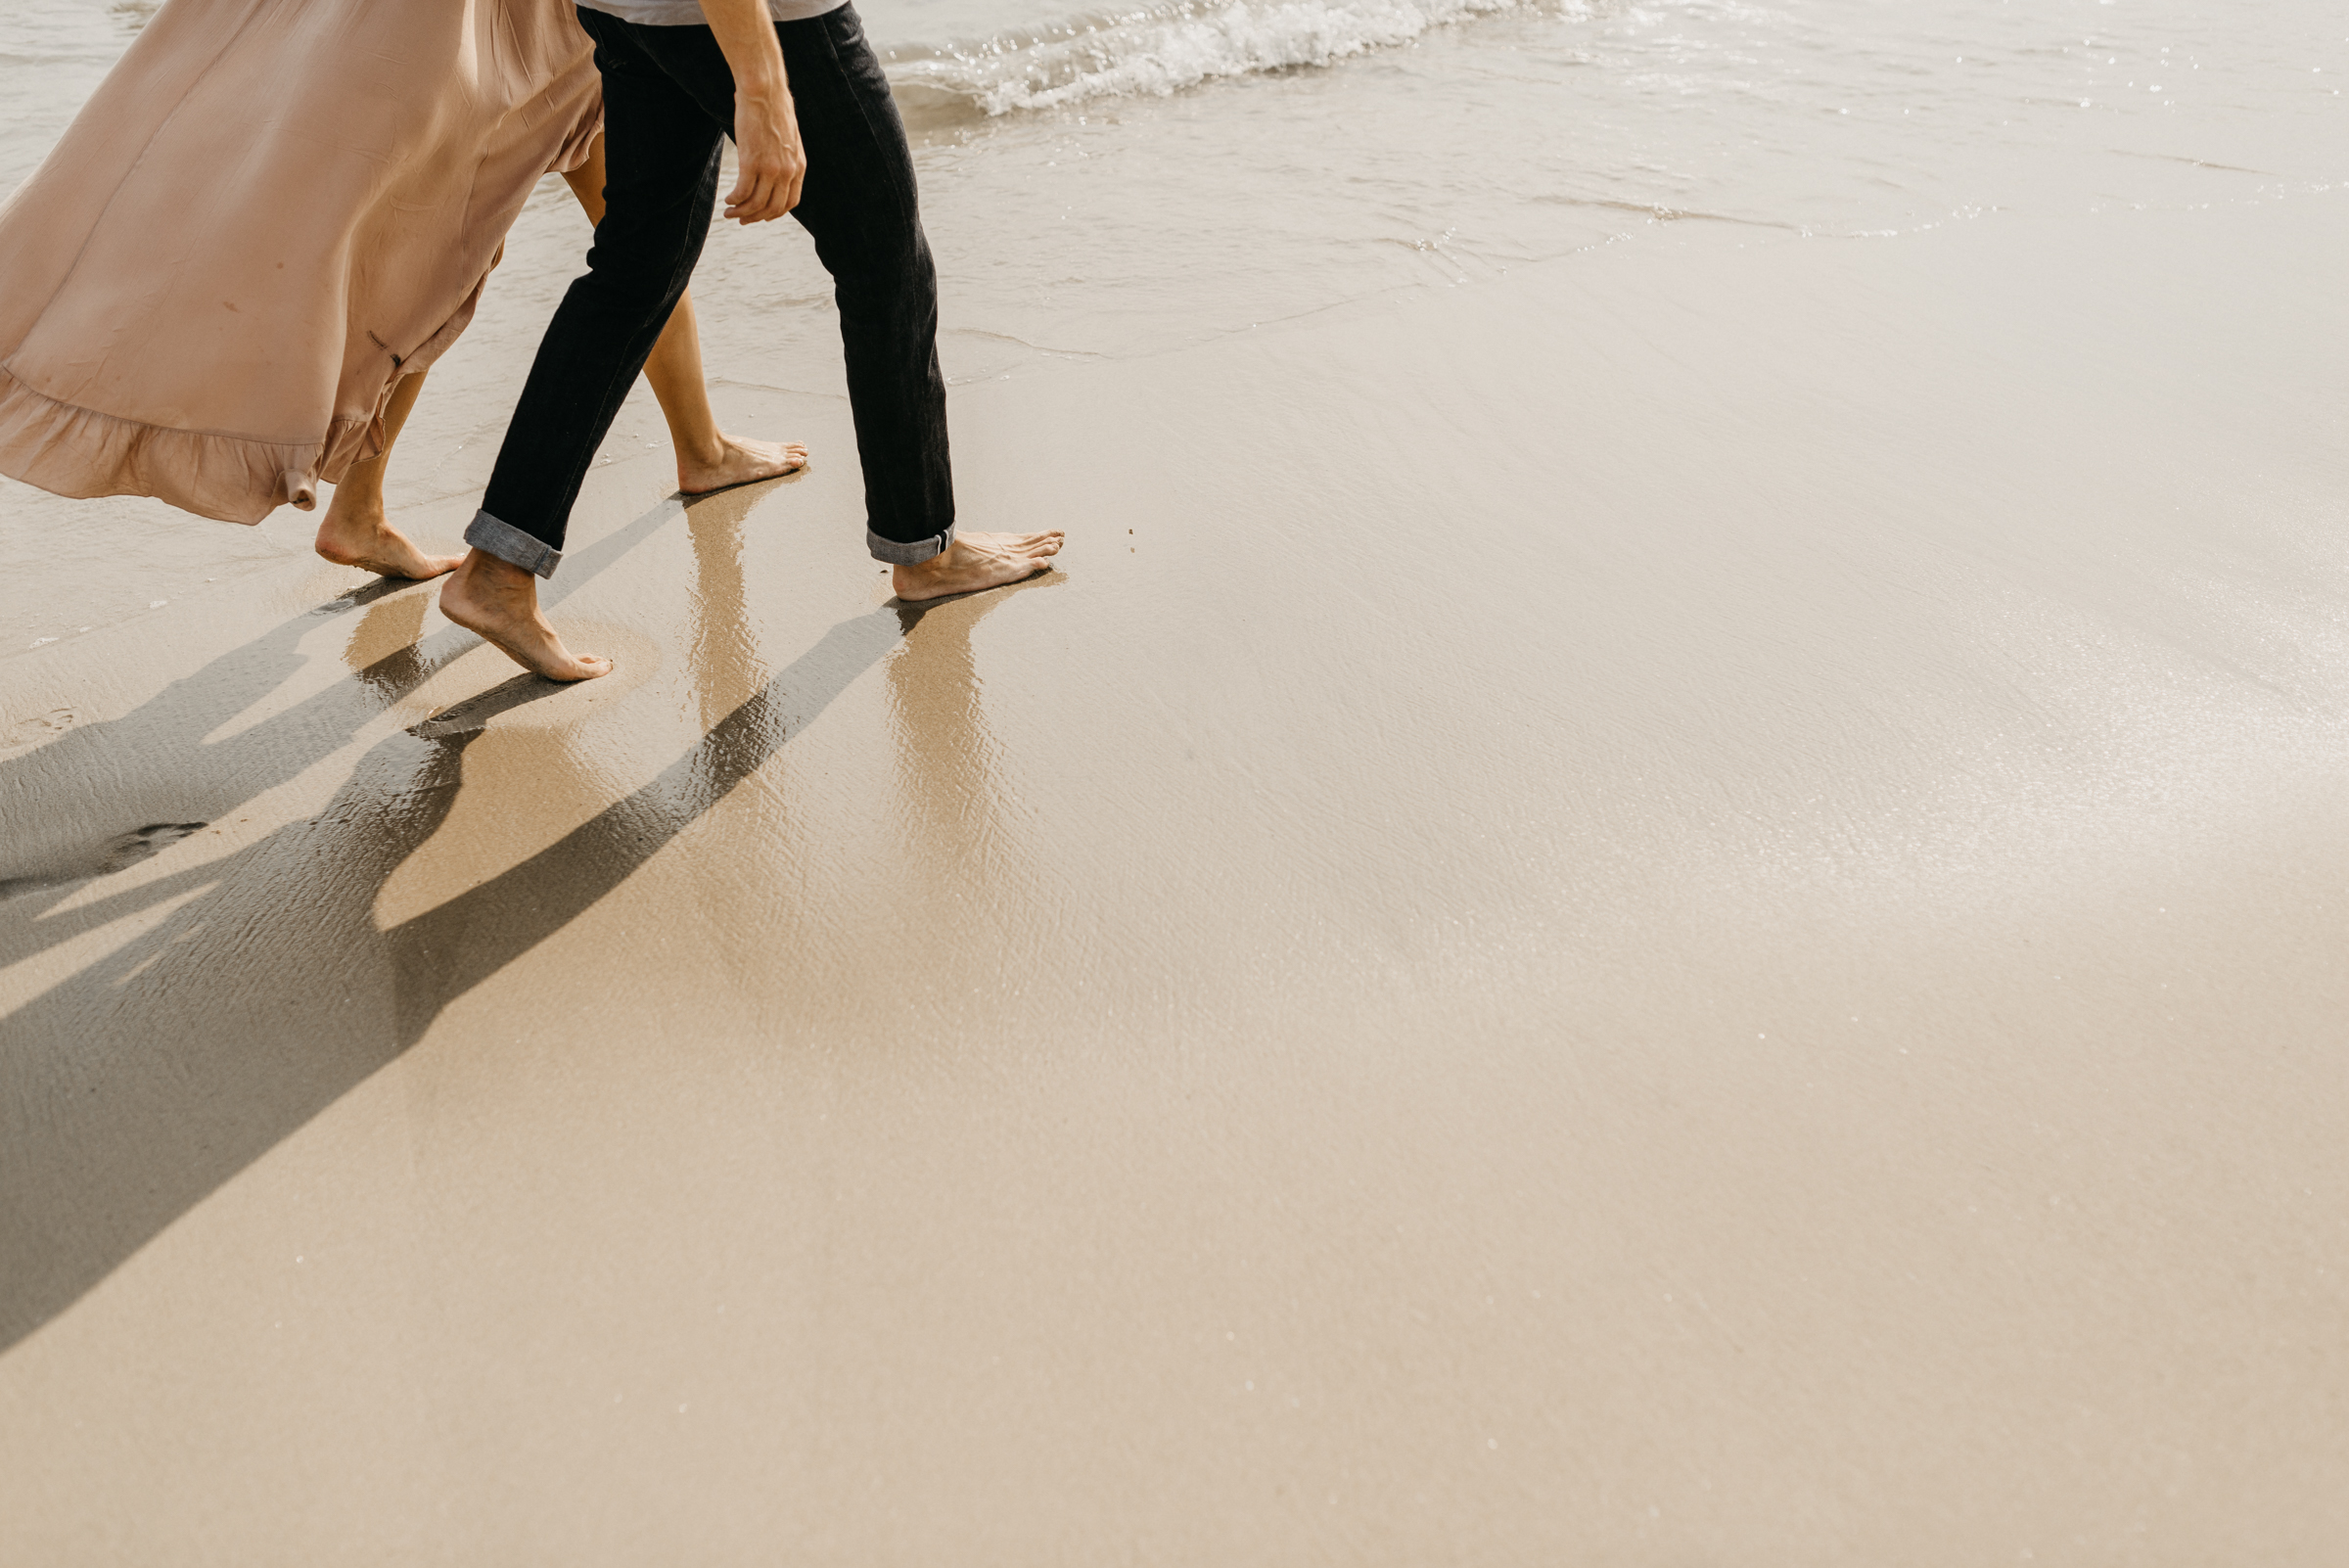 Isaiah + Taylor Photography - Venice Beach & Santa Monica Engagement Session, Los Angeles Wedding Photographer-052.jpg